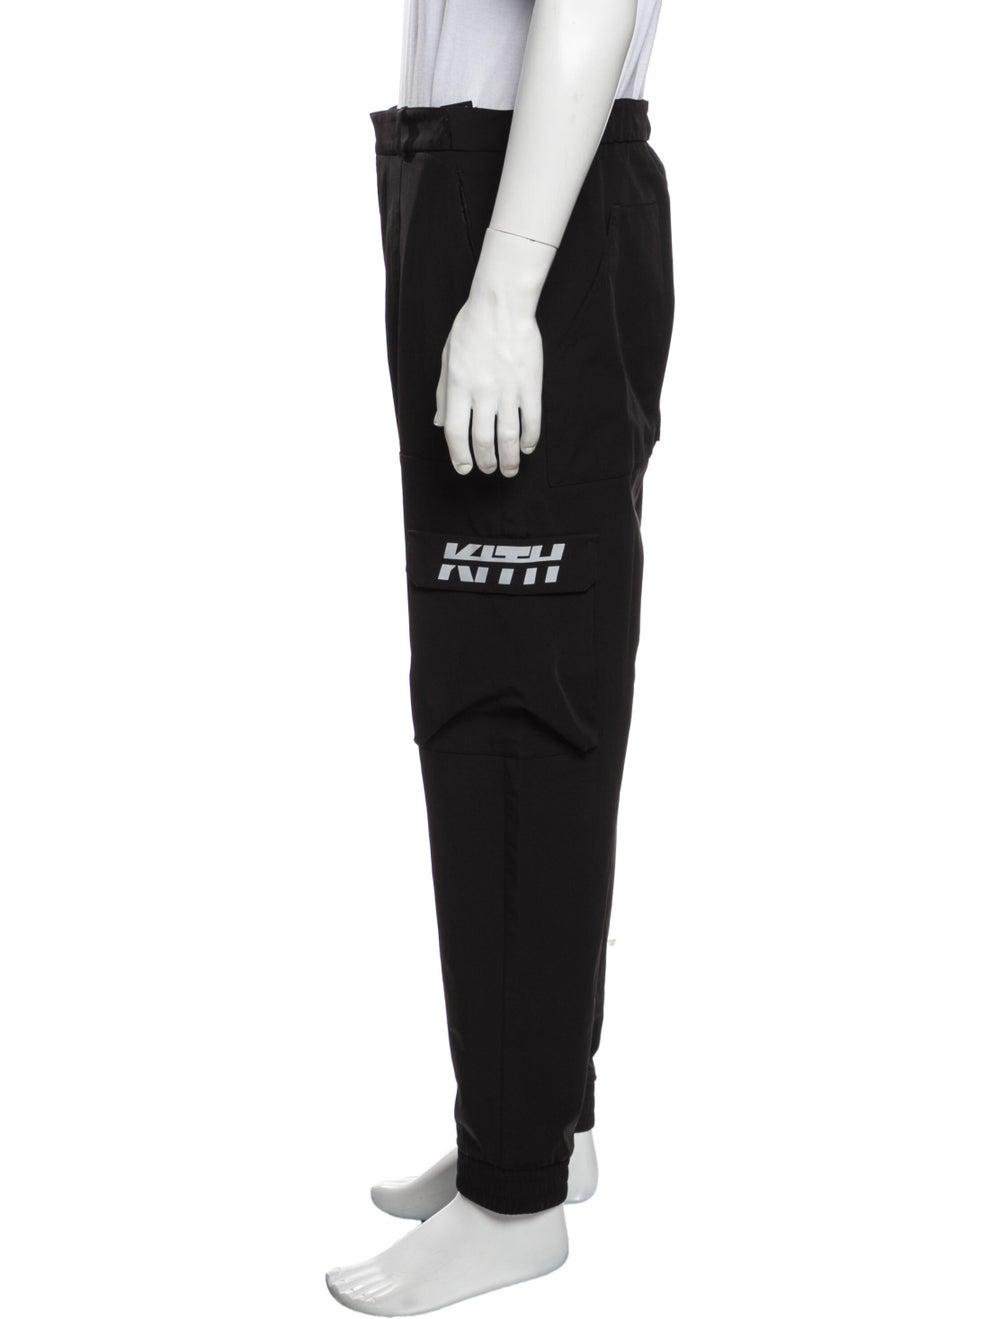 Kith Graphic Print Cargo Pants Black - image 2